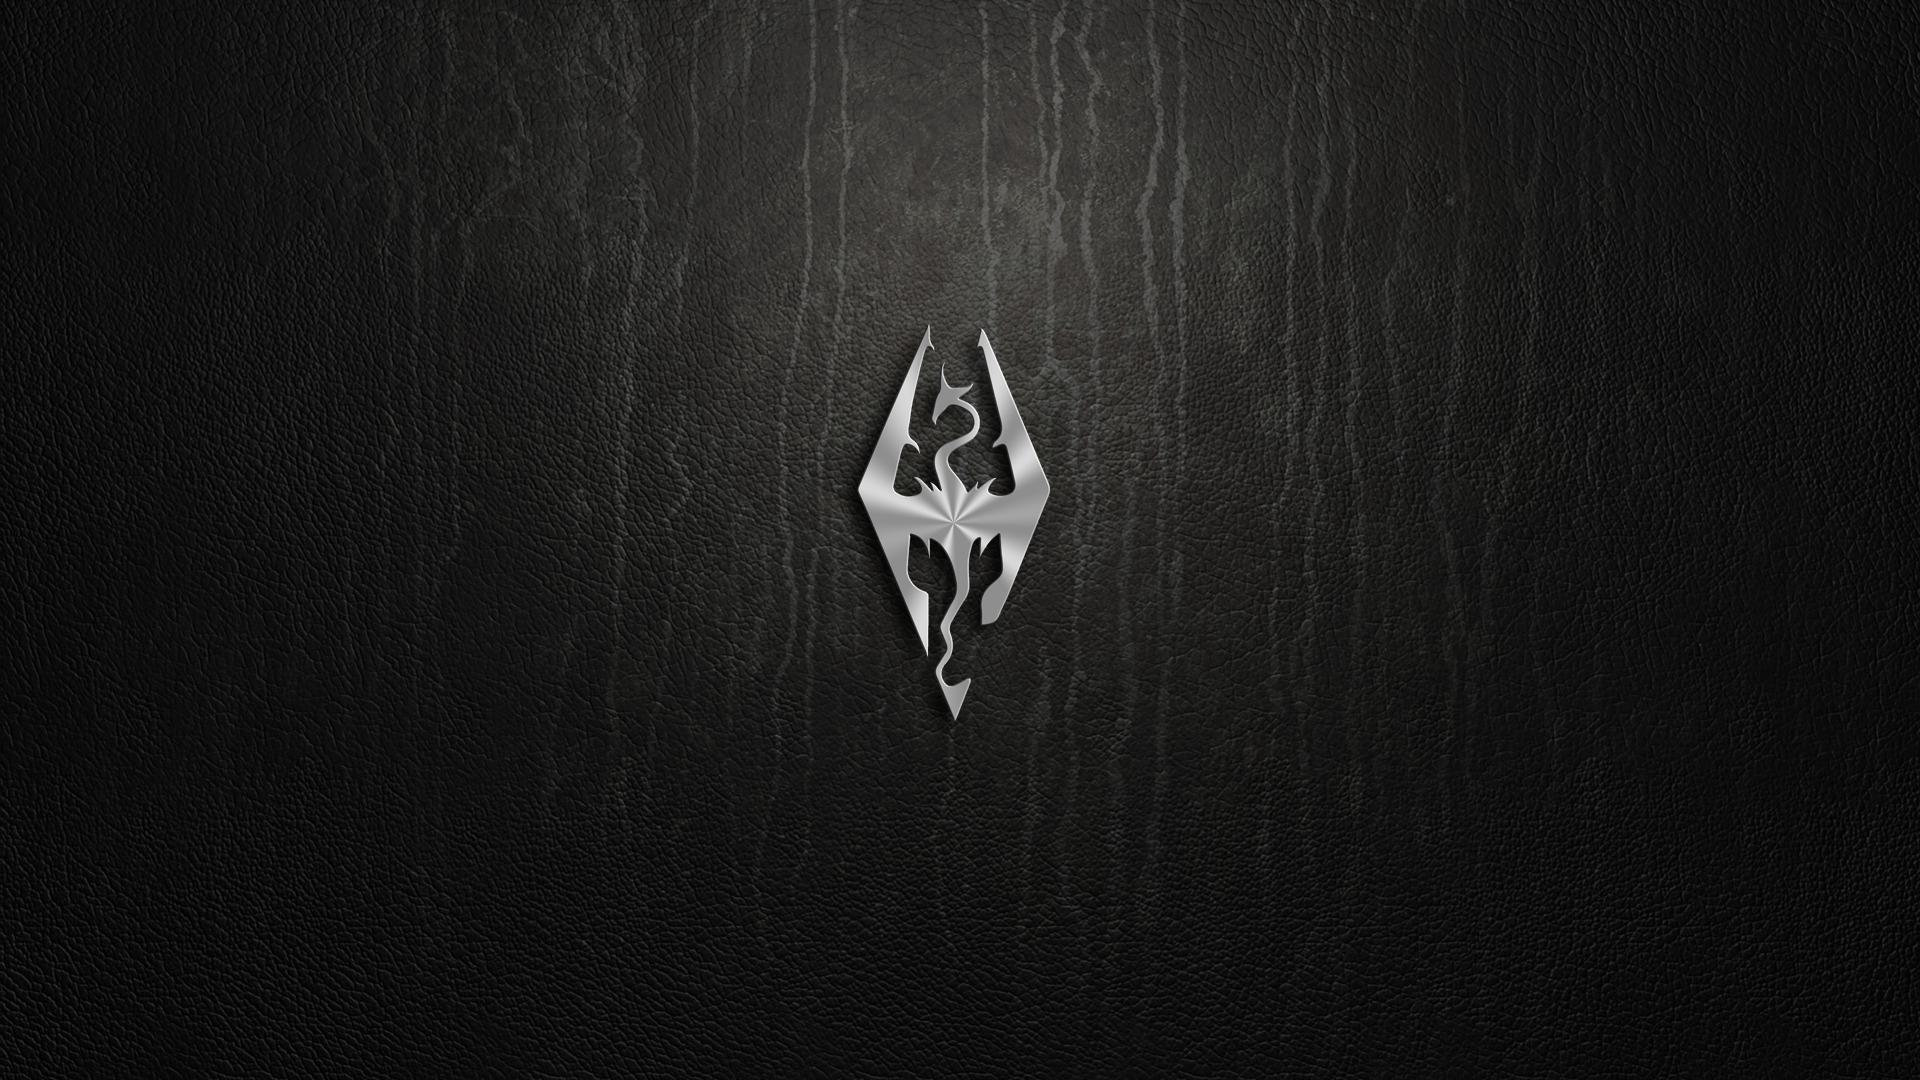 Skyrim Logo Hd Wallpapers Skyrim Wallpaper Skyrim Wallpaper Iphone Elder Scrolls V Skyrim